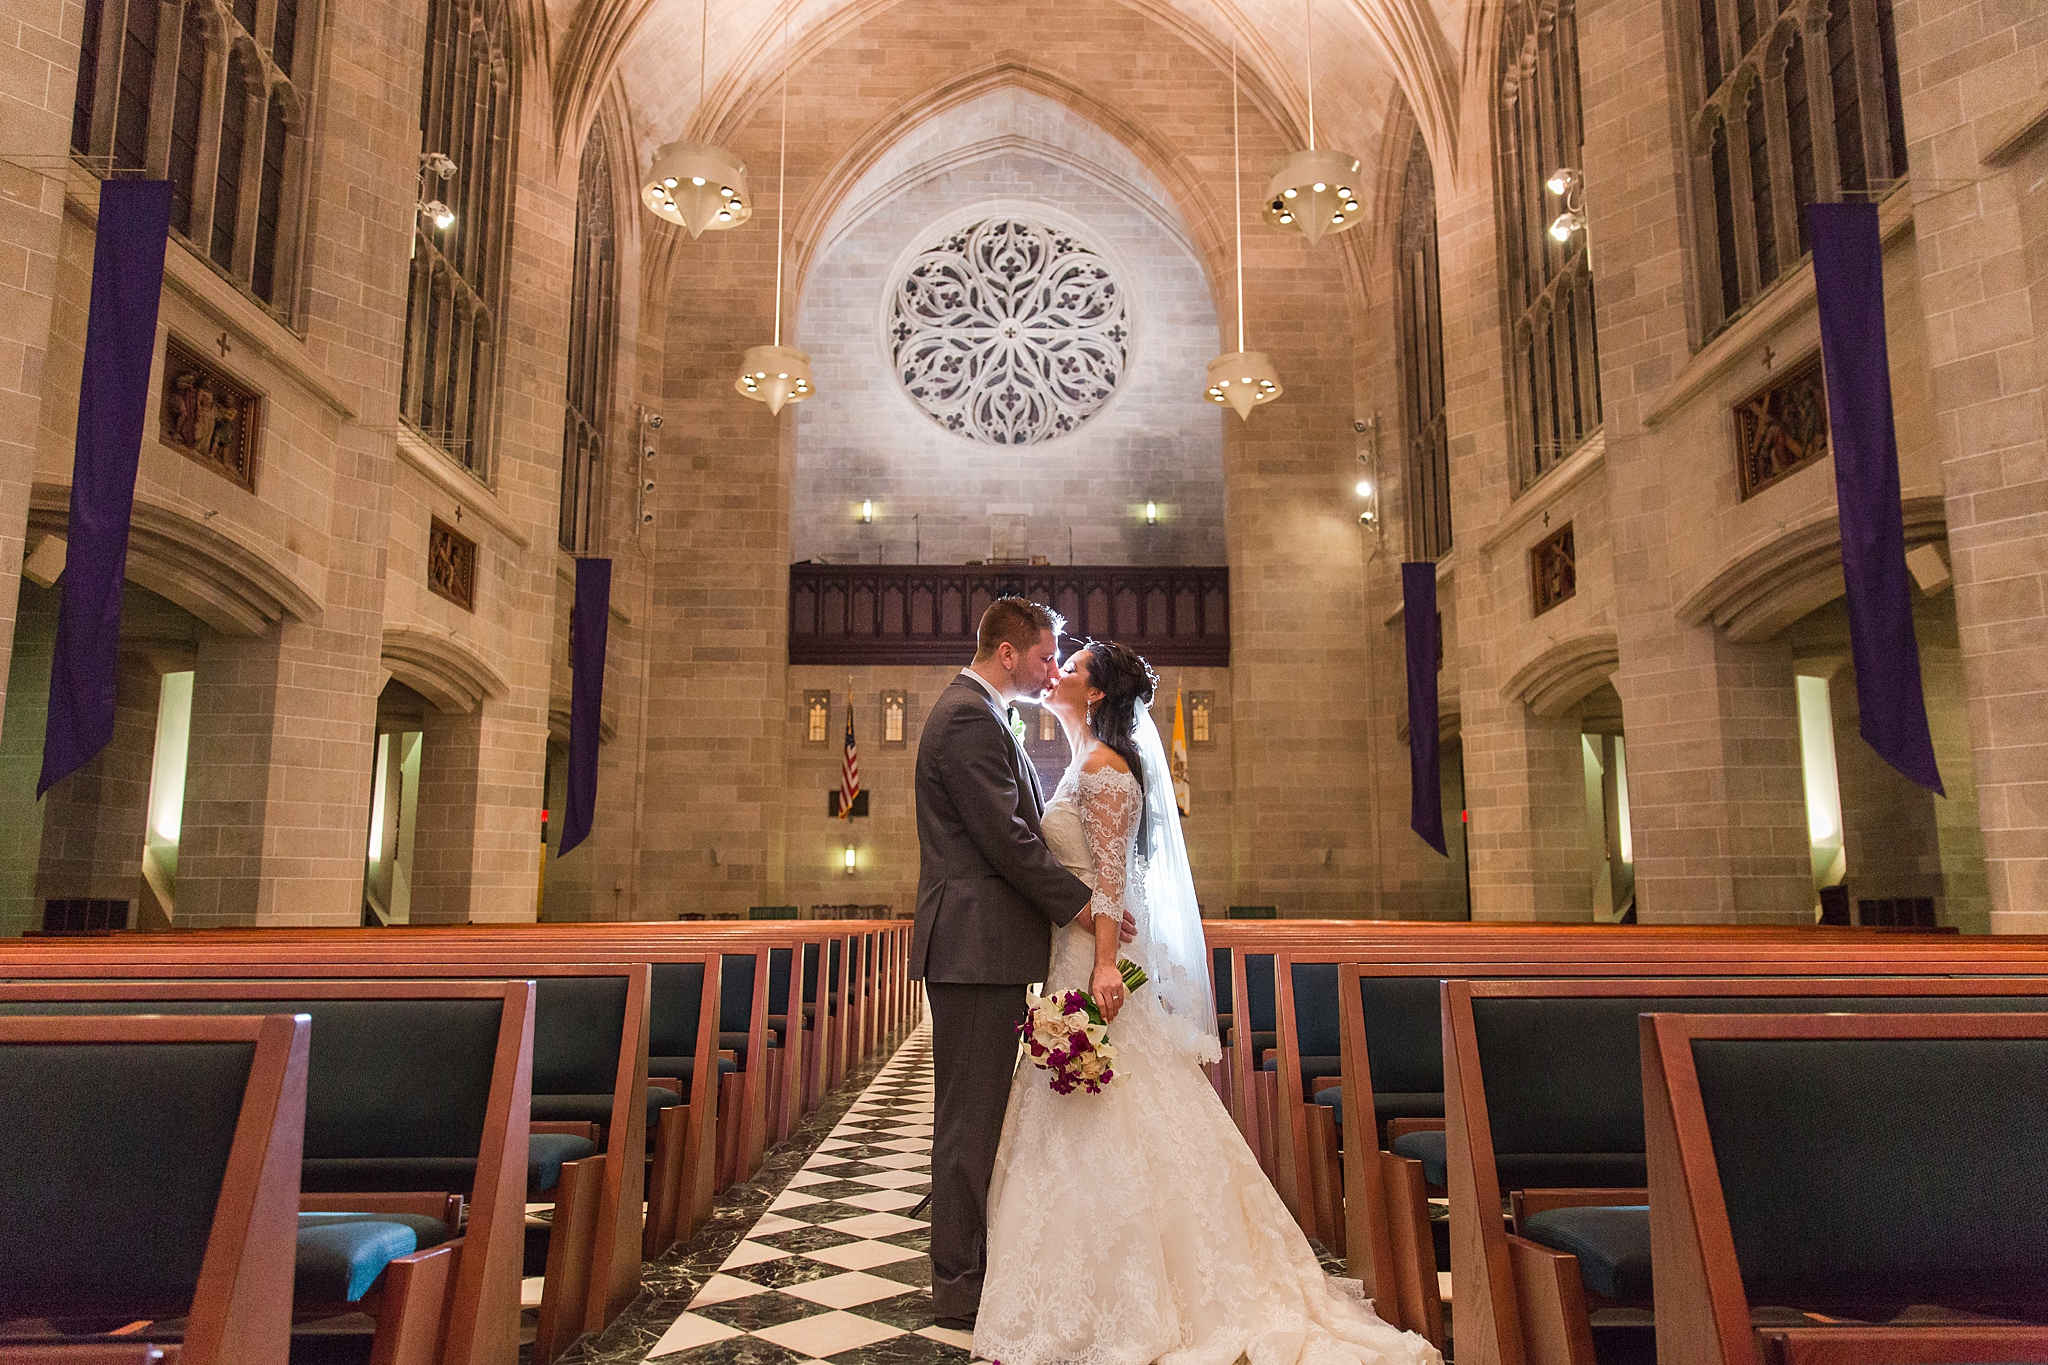 detroit-colony-club-wedding-regal-romantic-photography-in-detroit-mi-by-courtney-carolyn-photography_0033.jpg